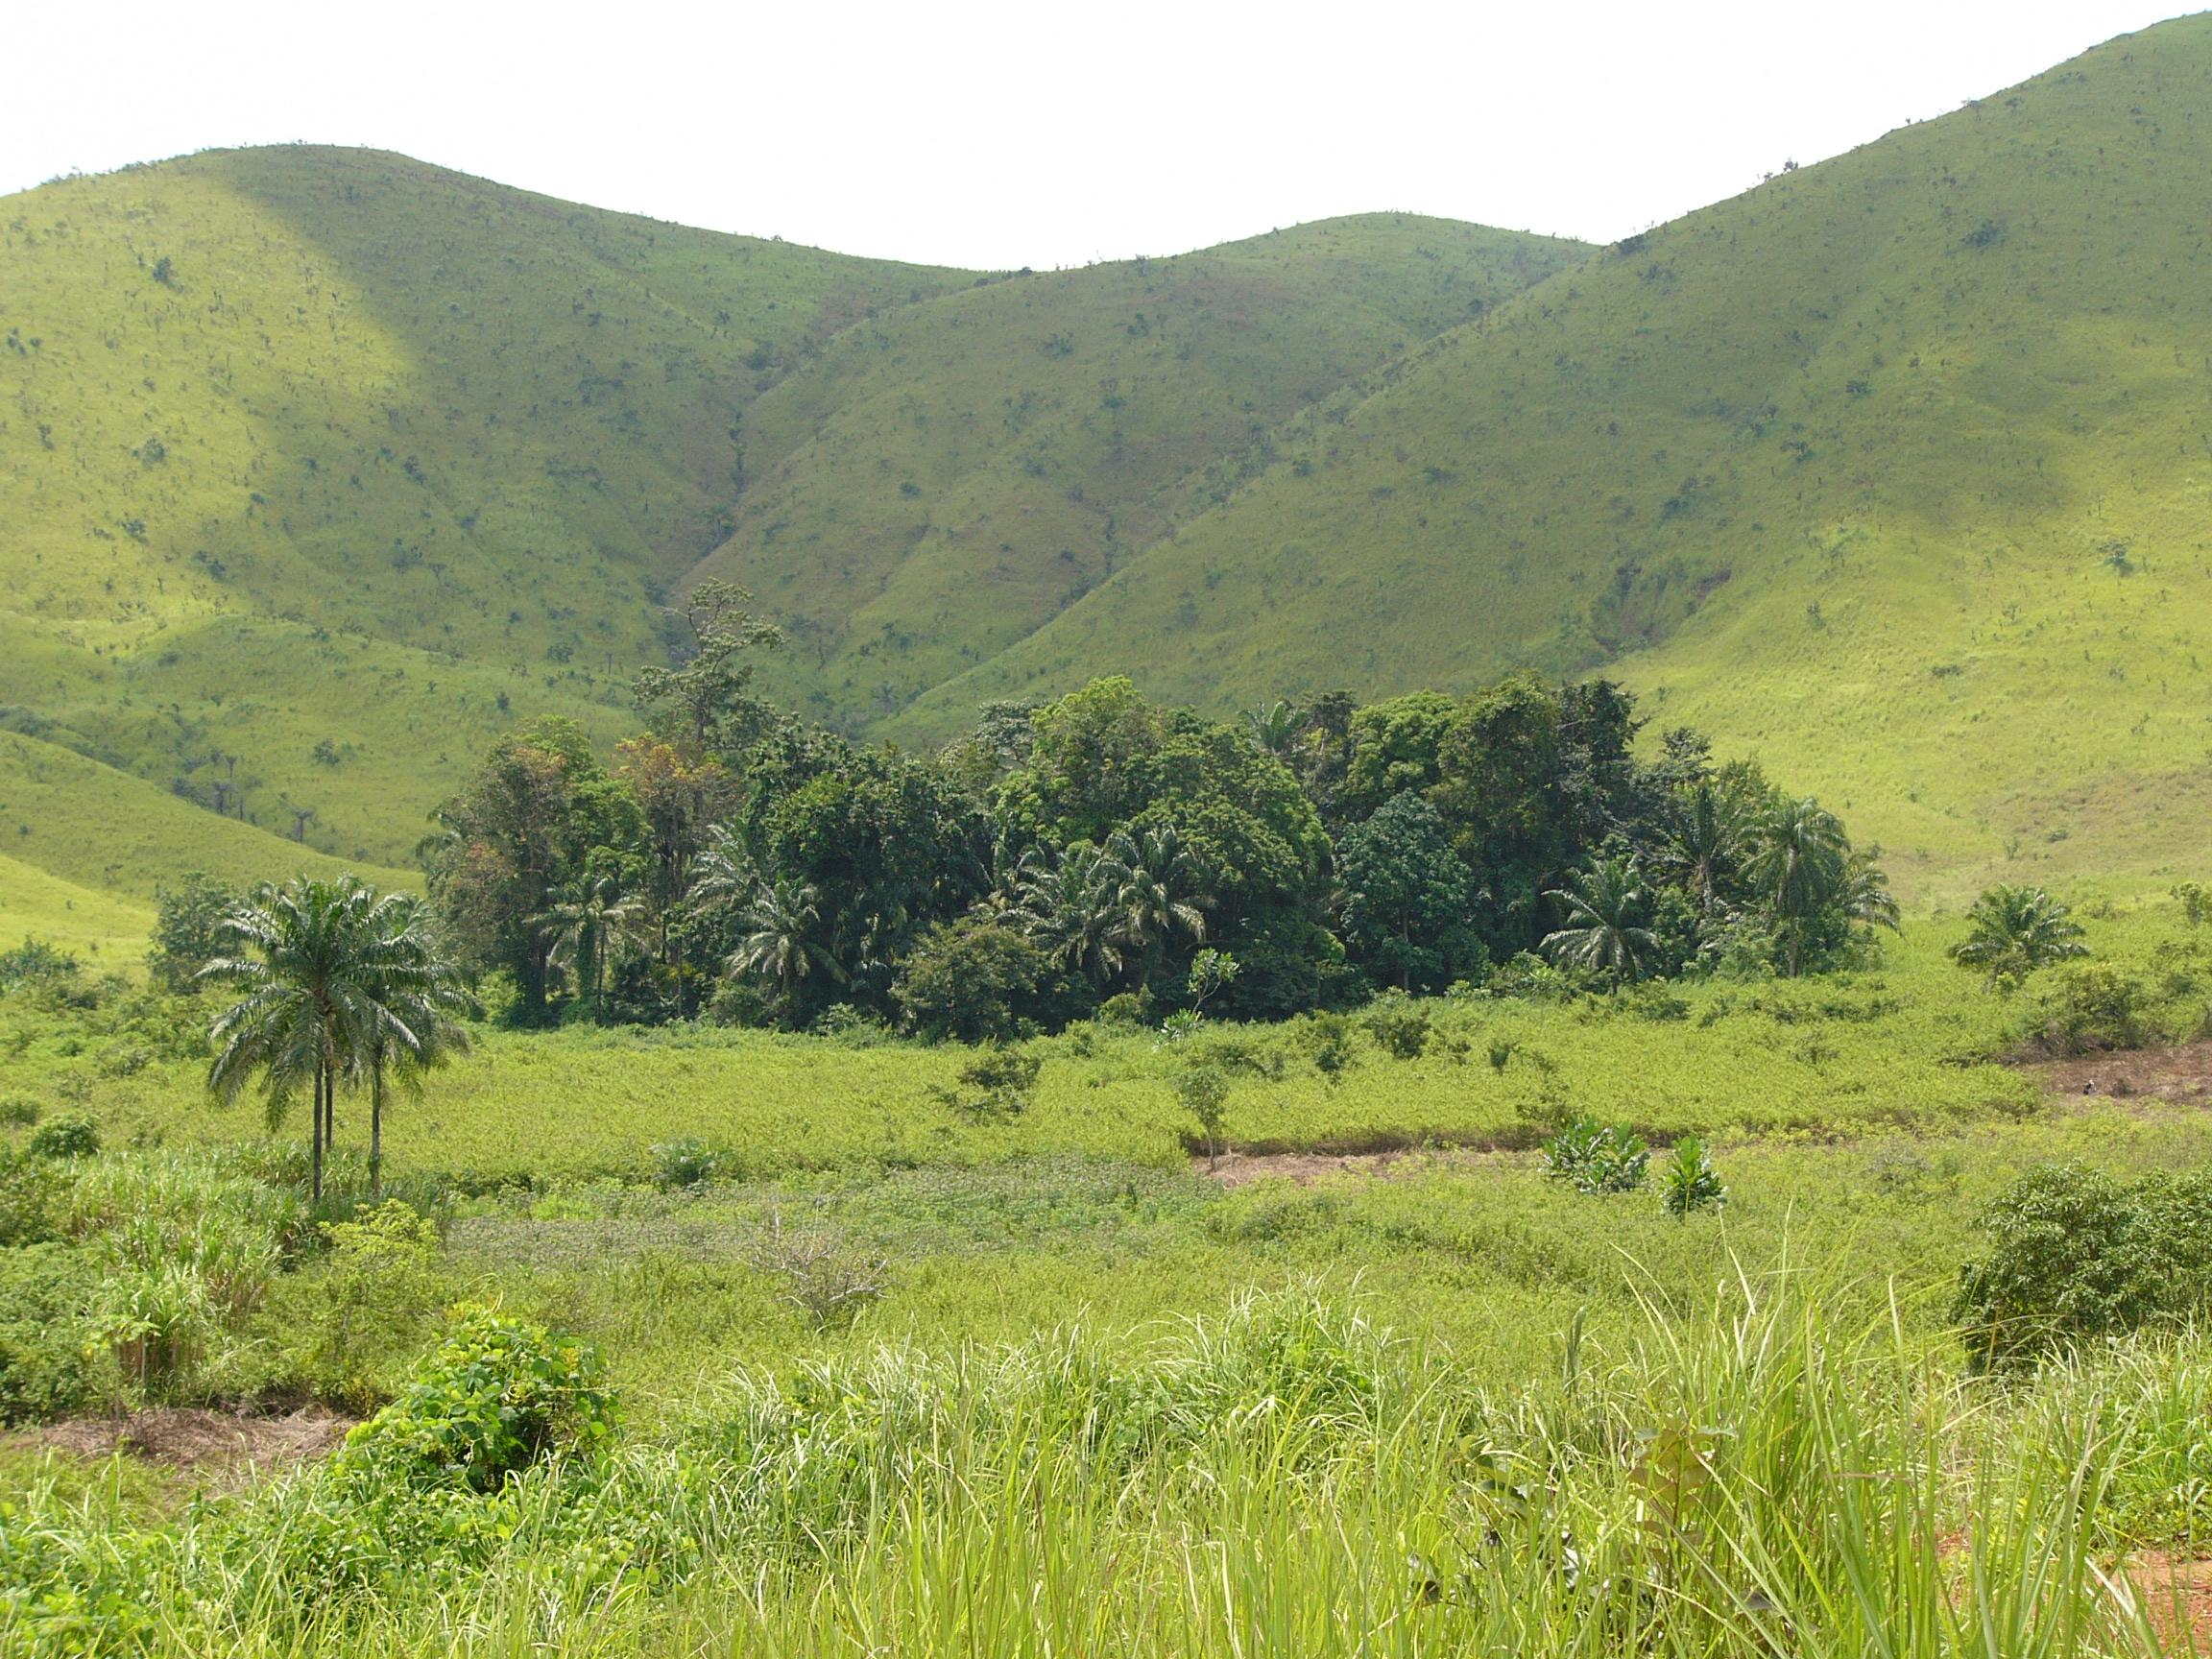 International Services - Western Niari Polymetallic Survey, Republic of Congo (2010)